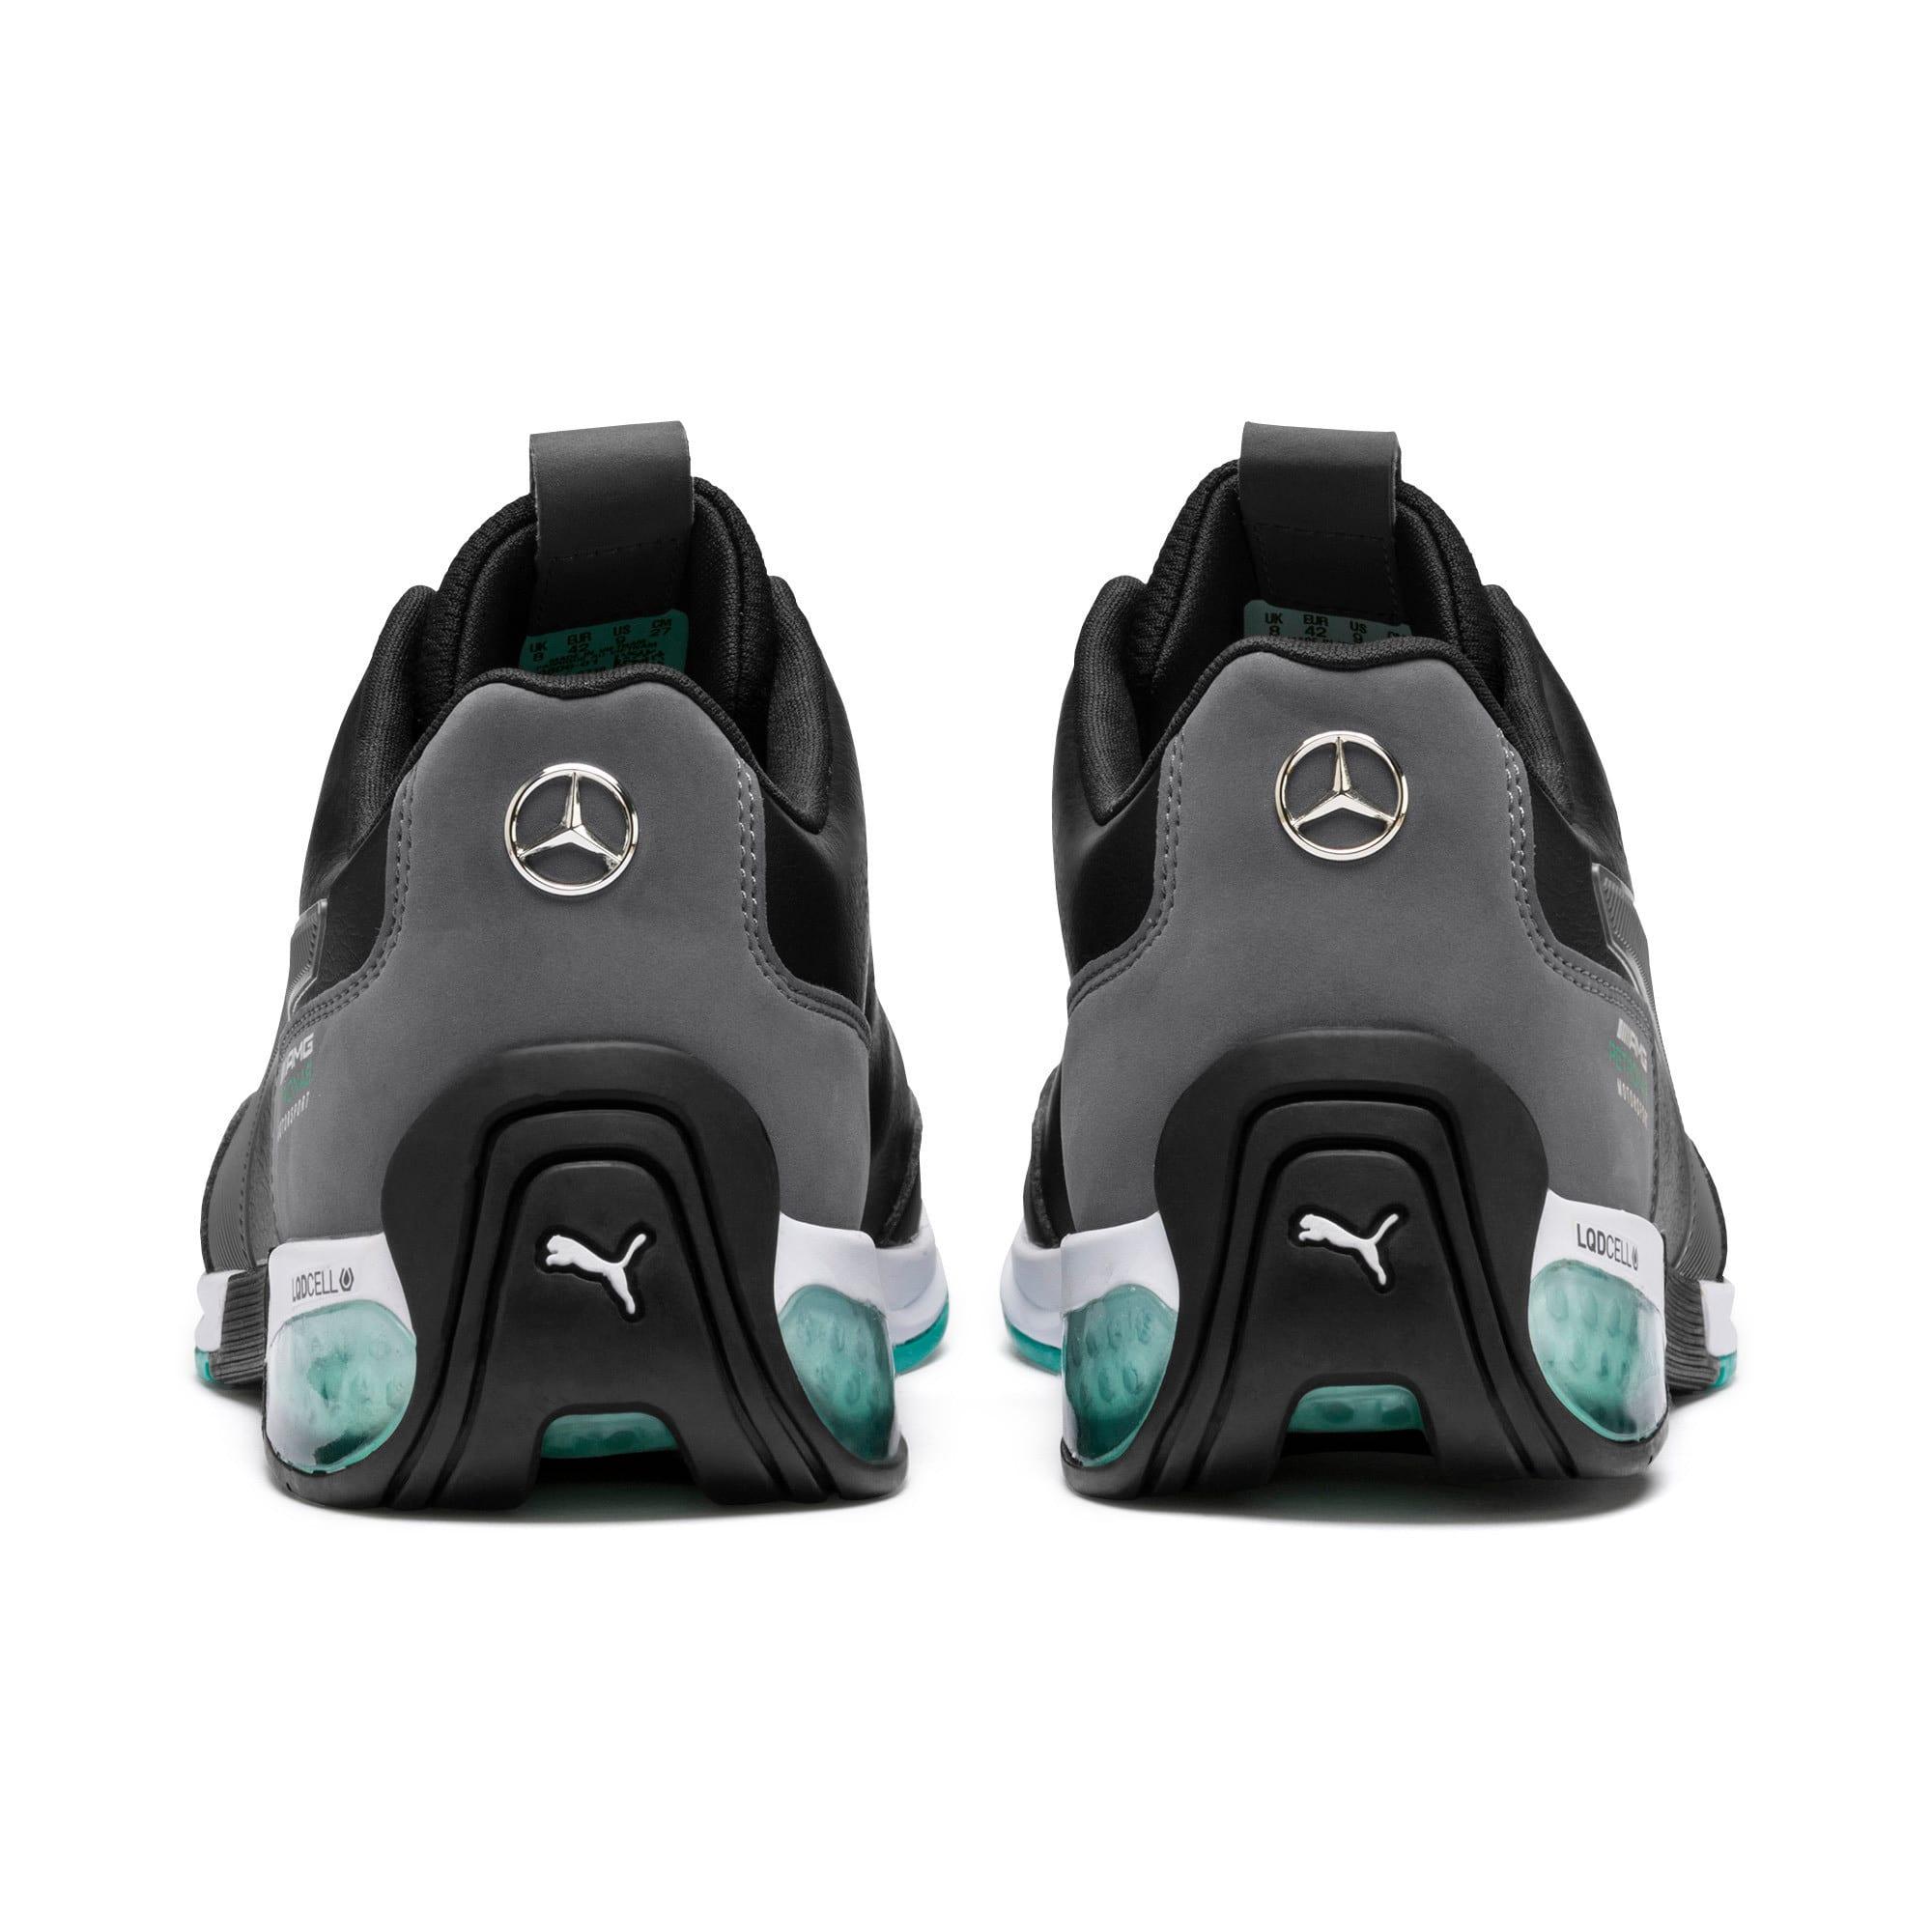 Thumbnail 4 of Mercedes AMG Petronas Motorsport Kart Cat X Trainers, Puma Black-Smoked Pearl, medium